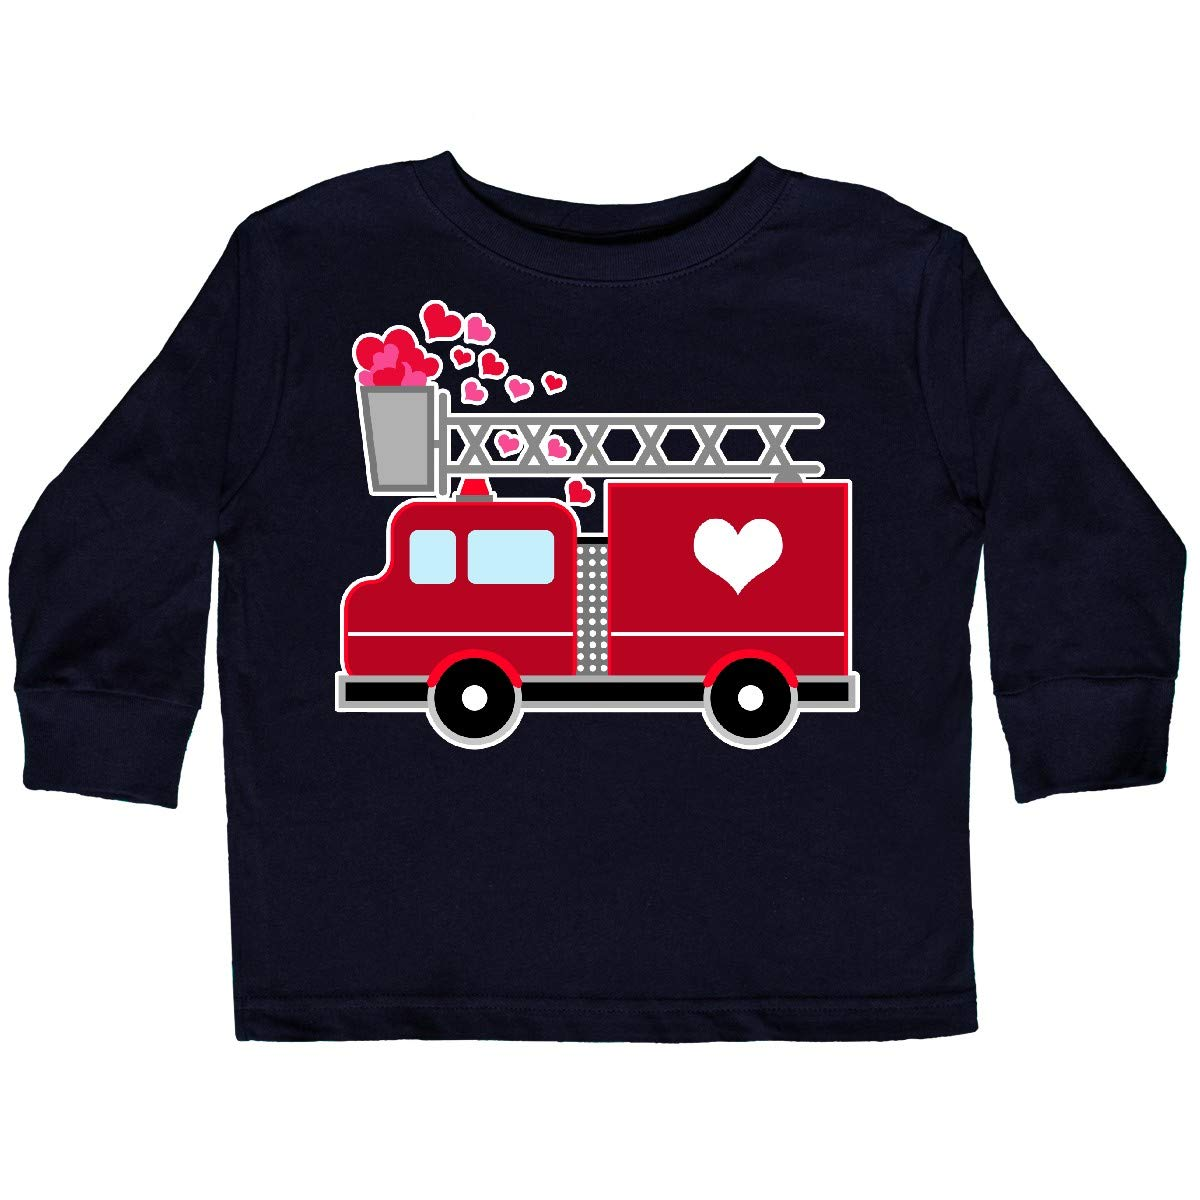 825220d3 Valentines Day Toddler Shirt | Kuenzi Turf & Nursery